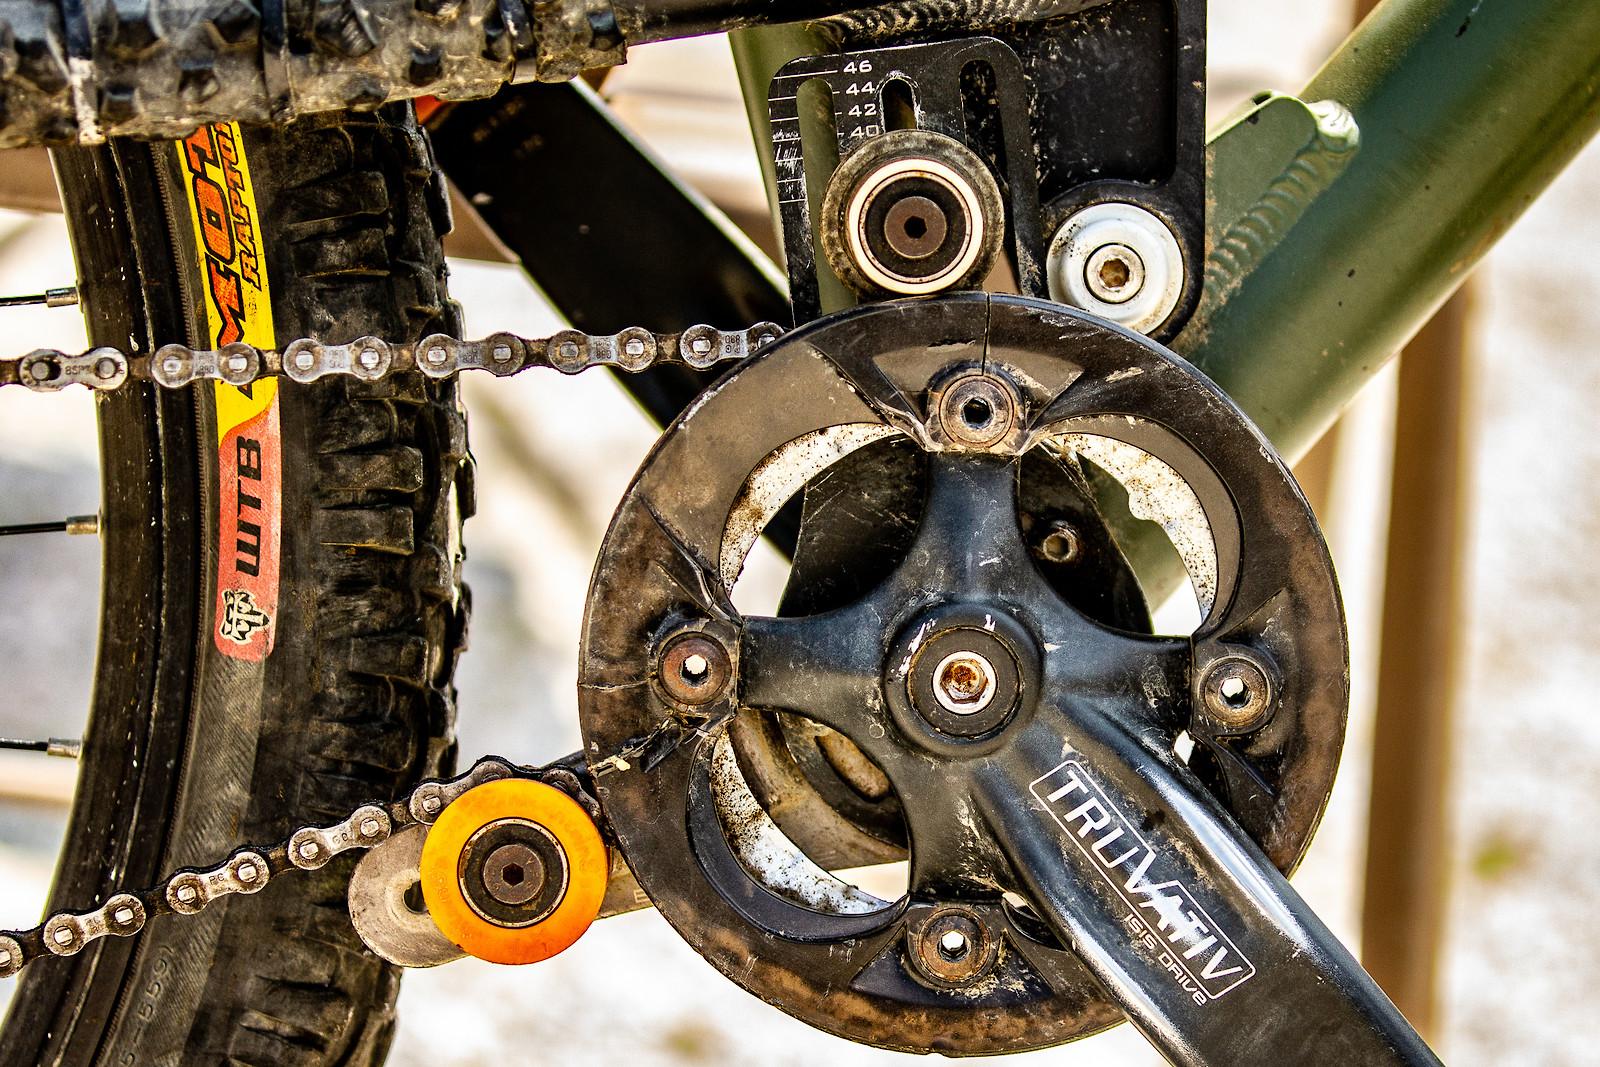 Chainguide Nightmares - JackRice - Mountain Biking Pictures - Vital MTB